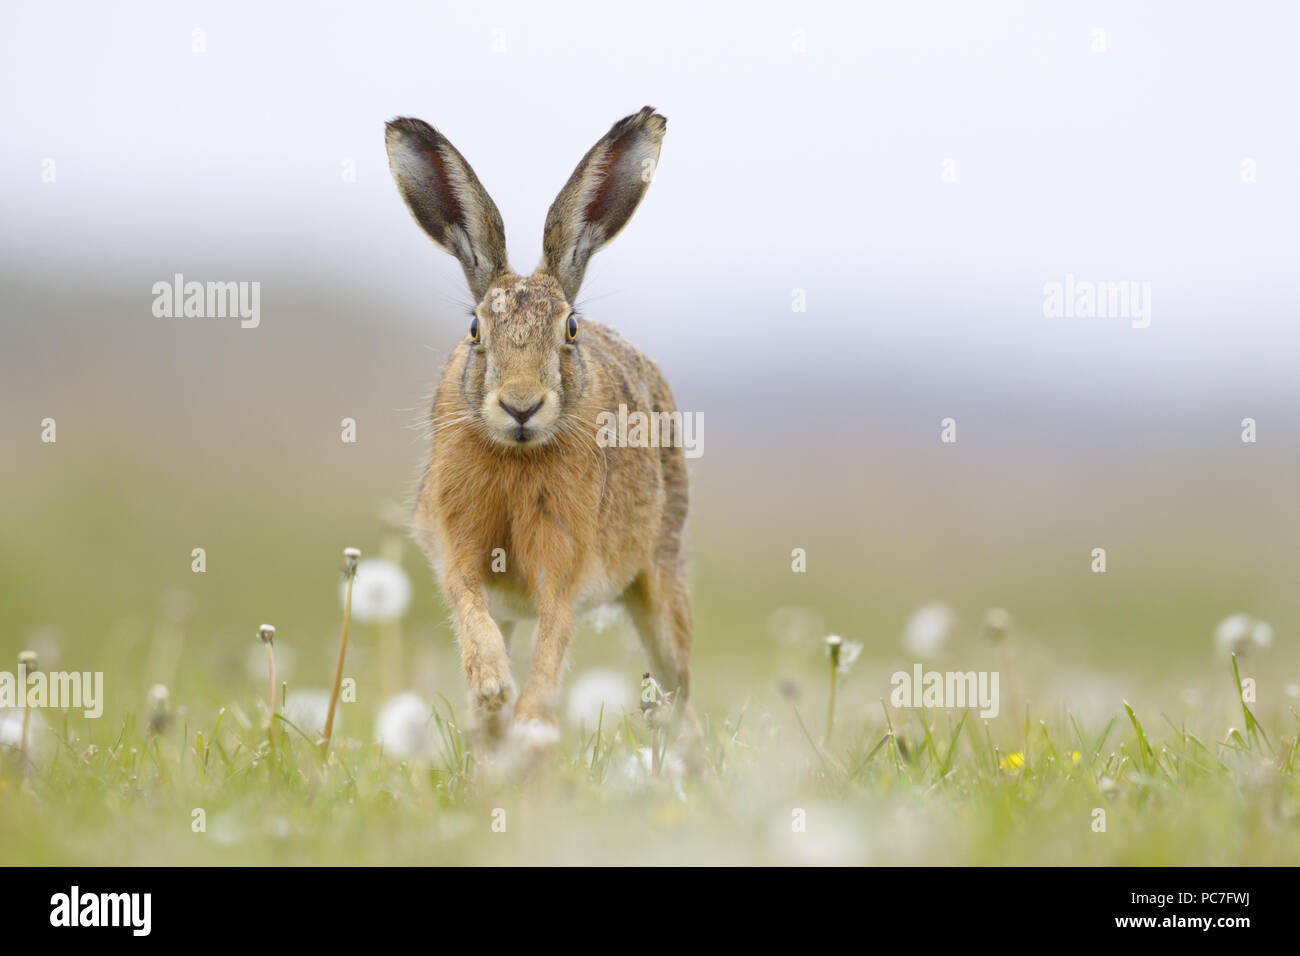 European Hare (Lepus europaeus) adult running through dandelion patch, South Norfolk, UK. May. - Stock Image